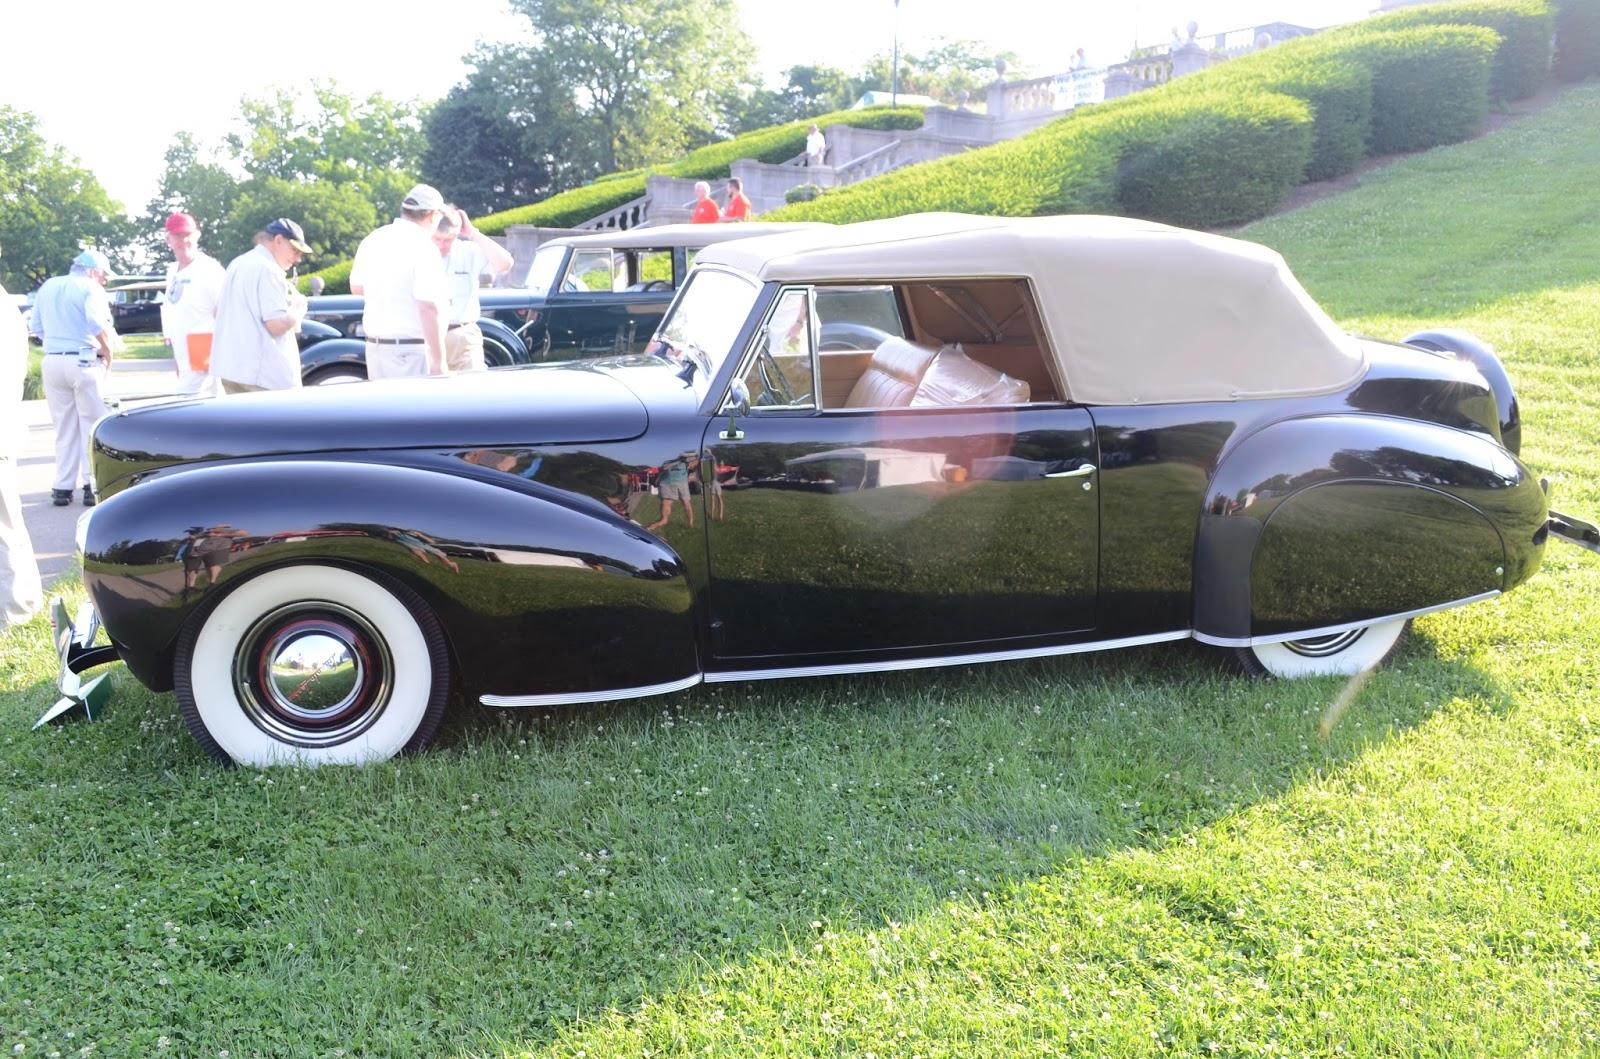 Turnerbudds Car Blog: Pre-War Classics at Ault Park